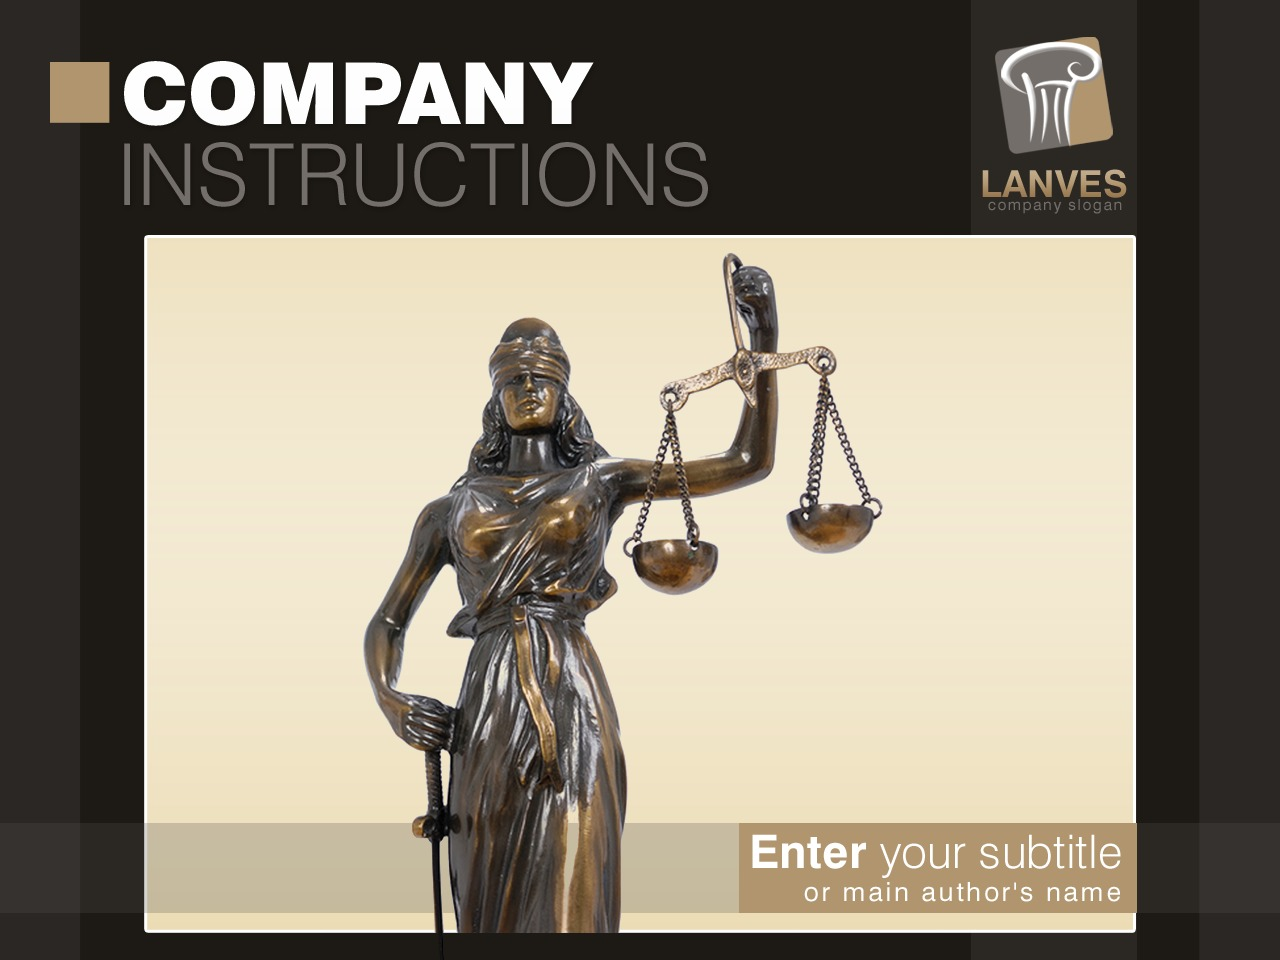 Szablon PowerPoint #28325 na temat: prawnik